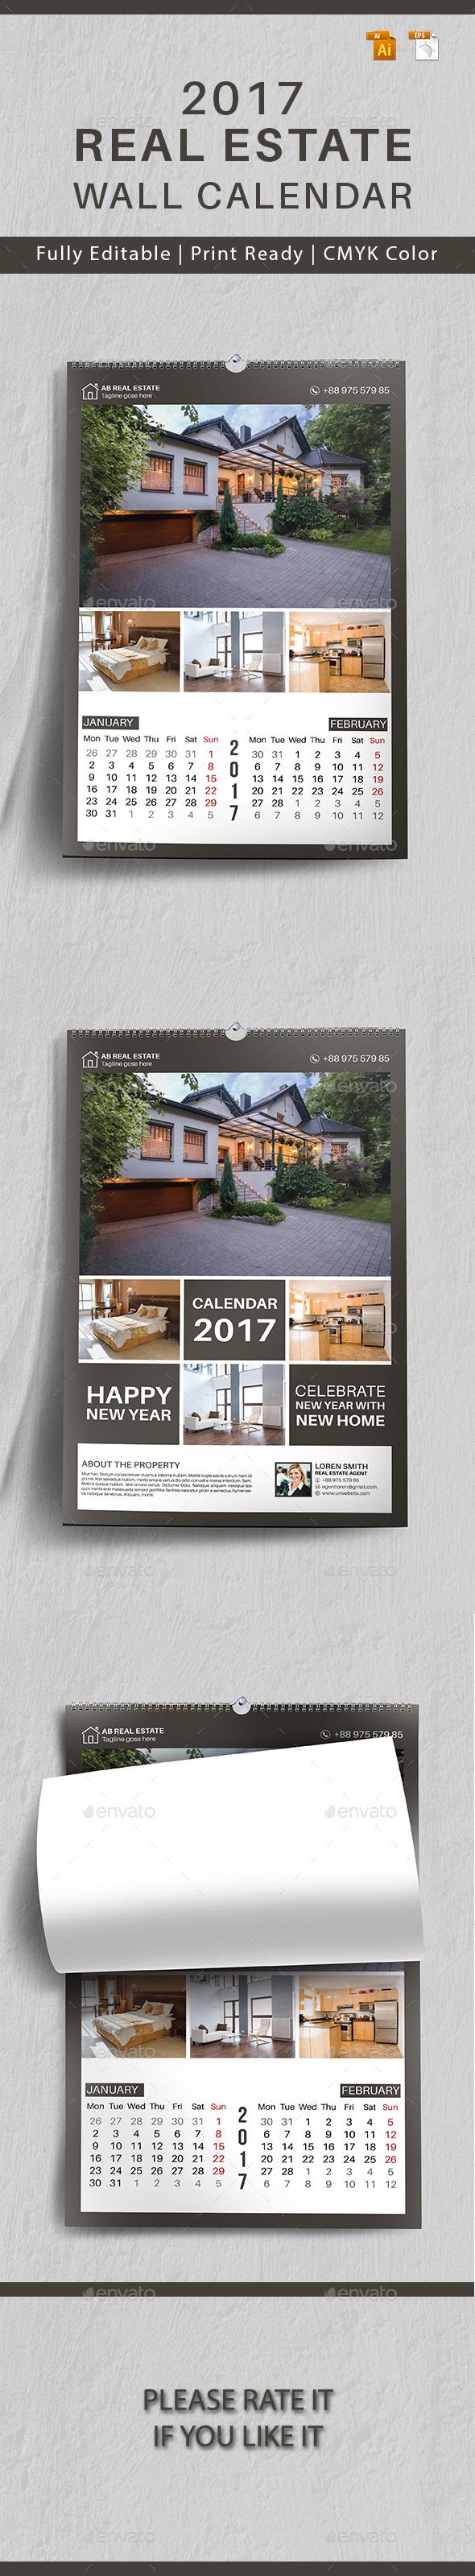 Real Estate Wall Calendar 2017